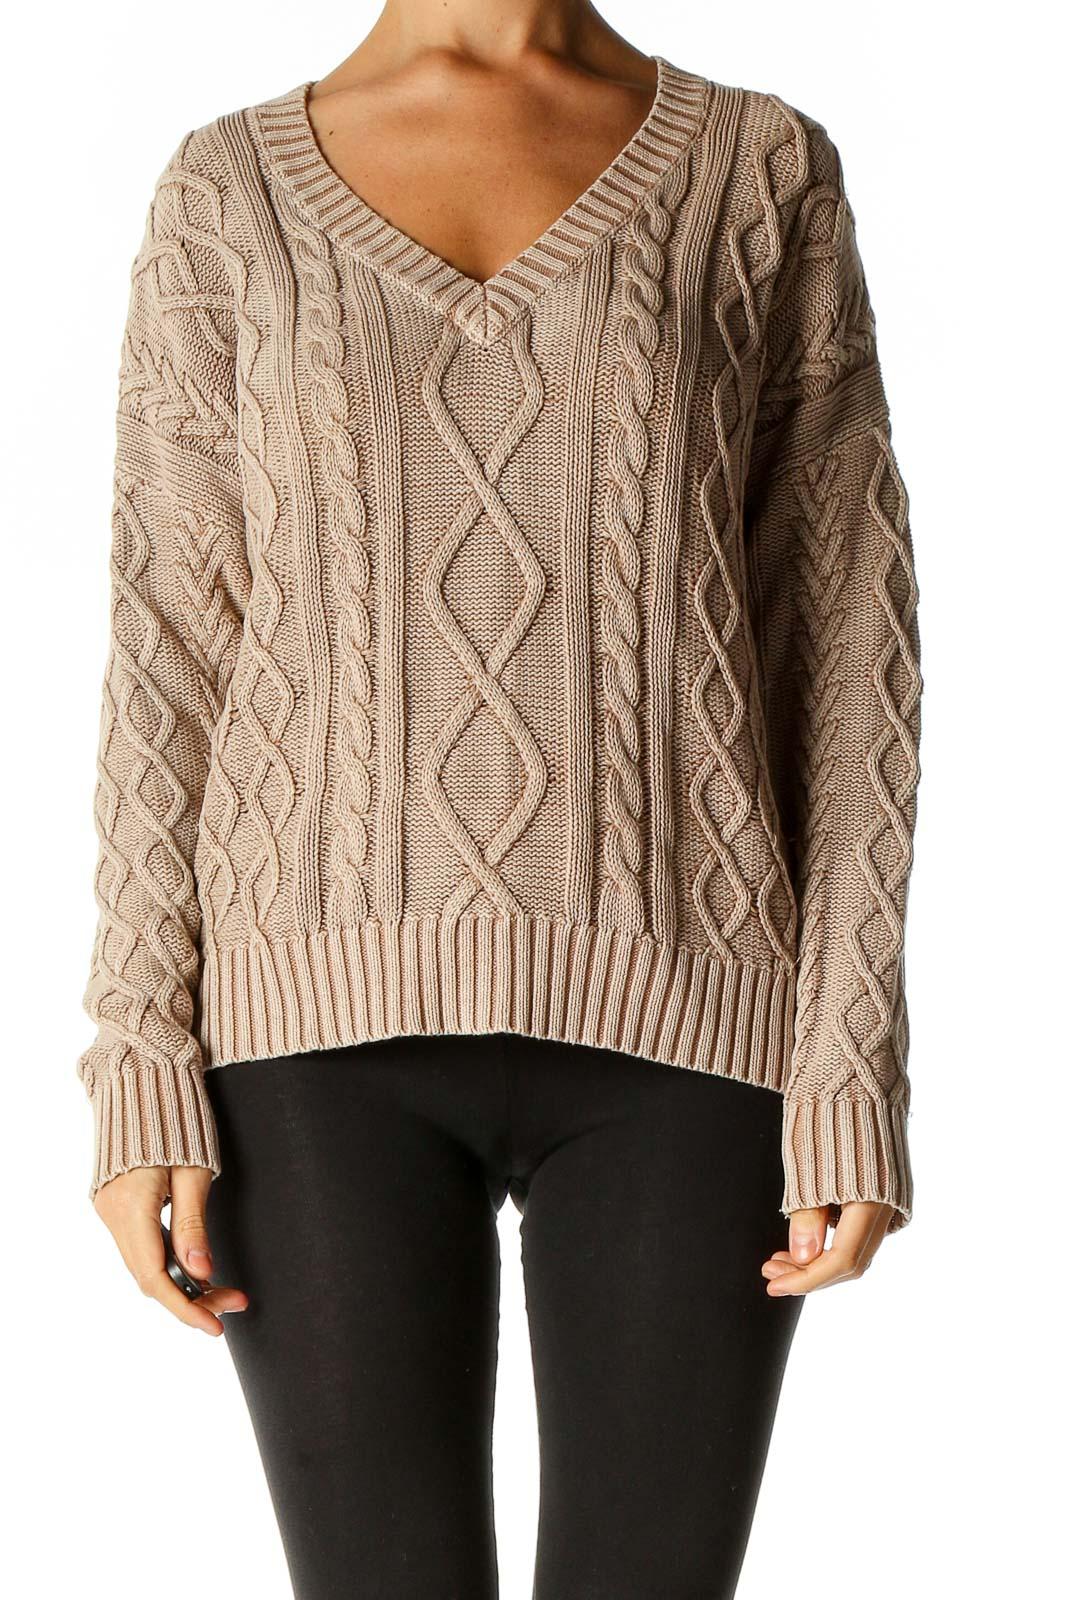 Beige Textured Sweater Front